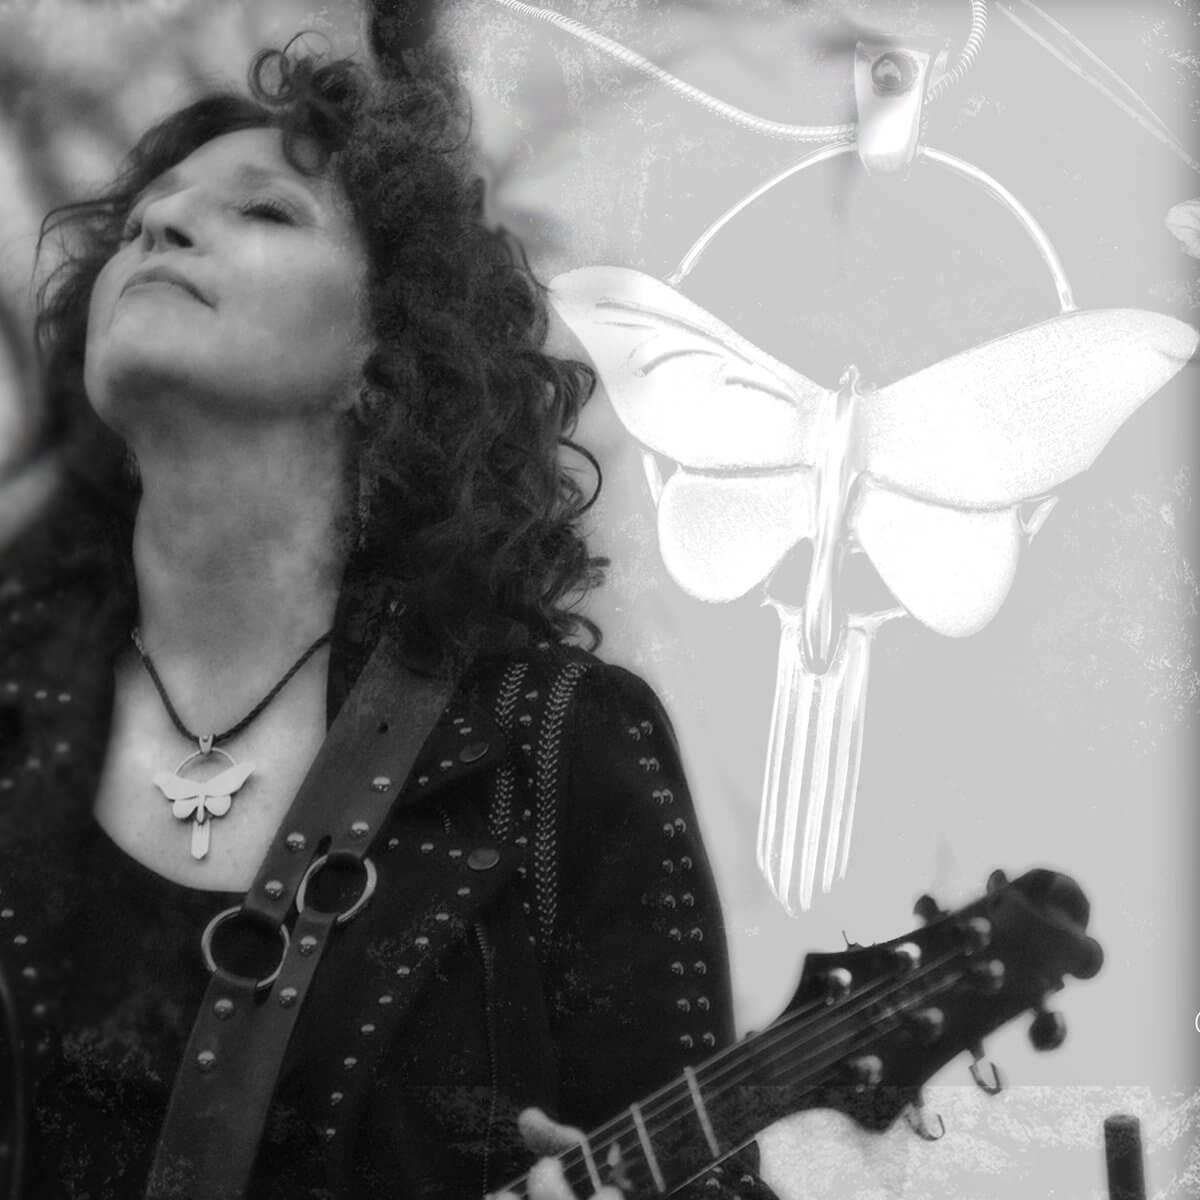 Valerie Romanoff wearing Dreams pendant on black cord